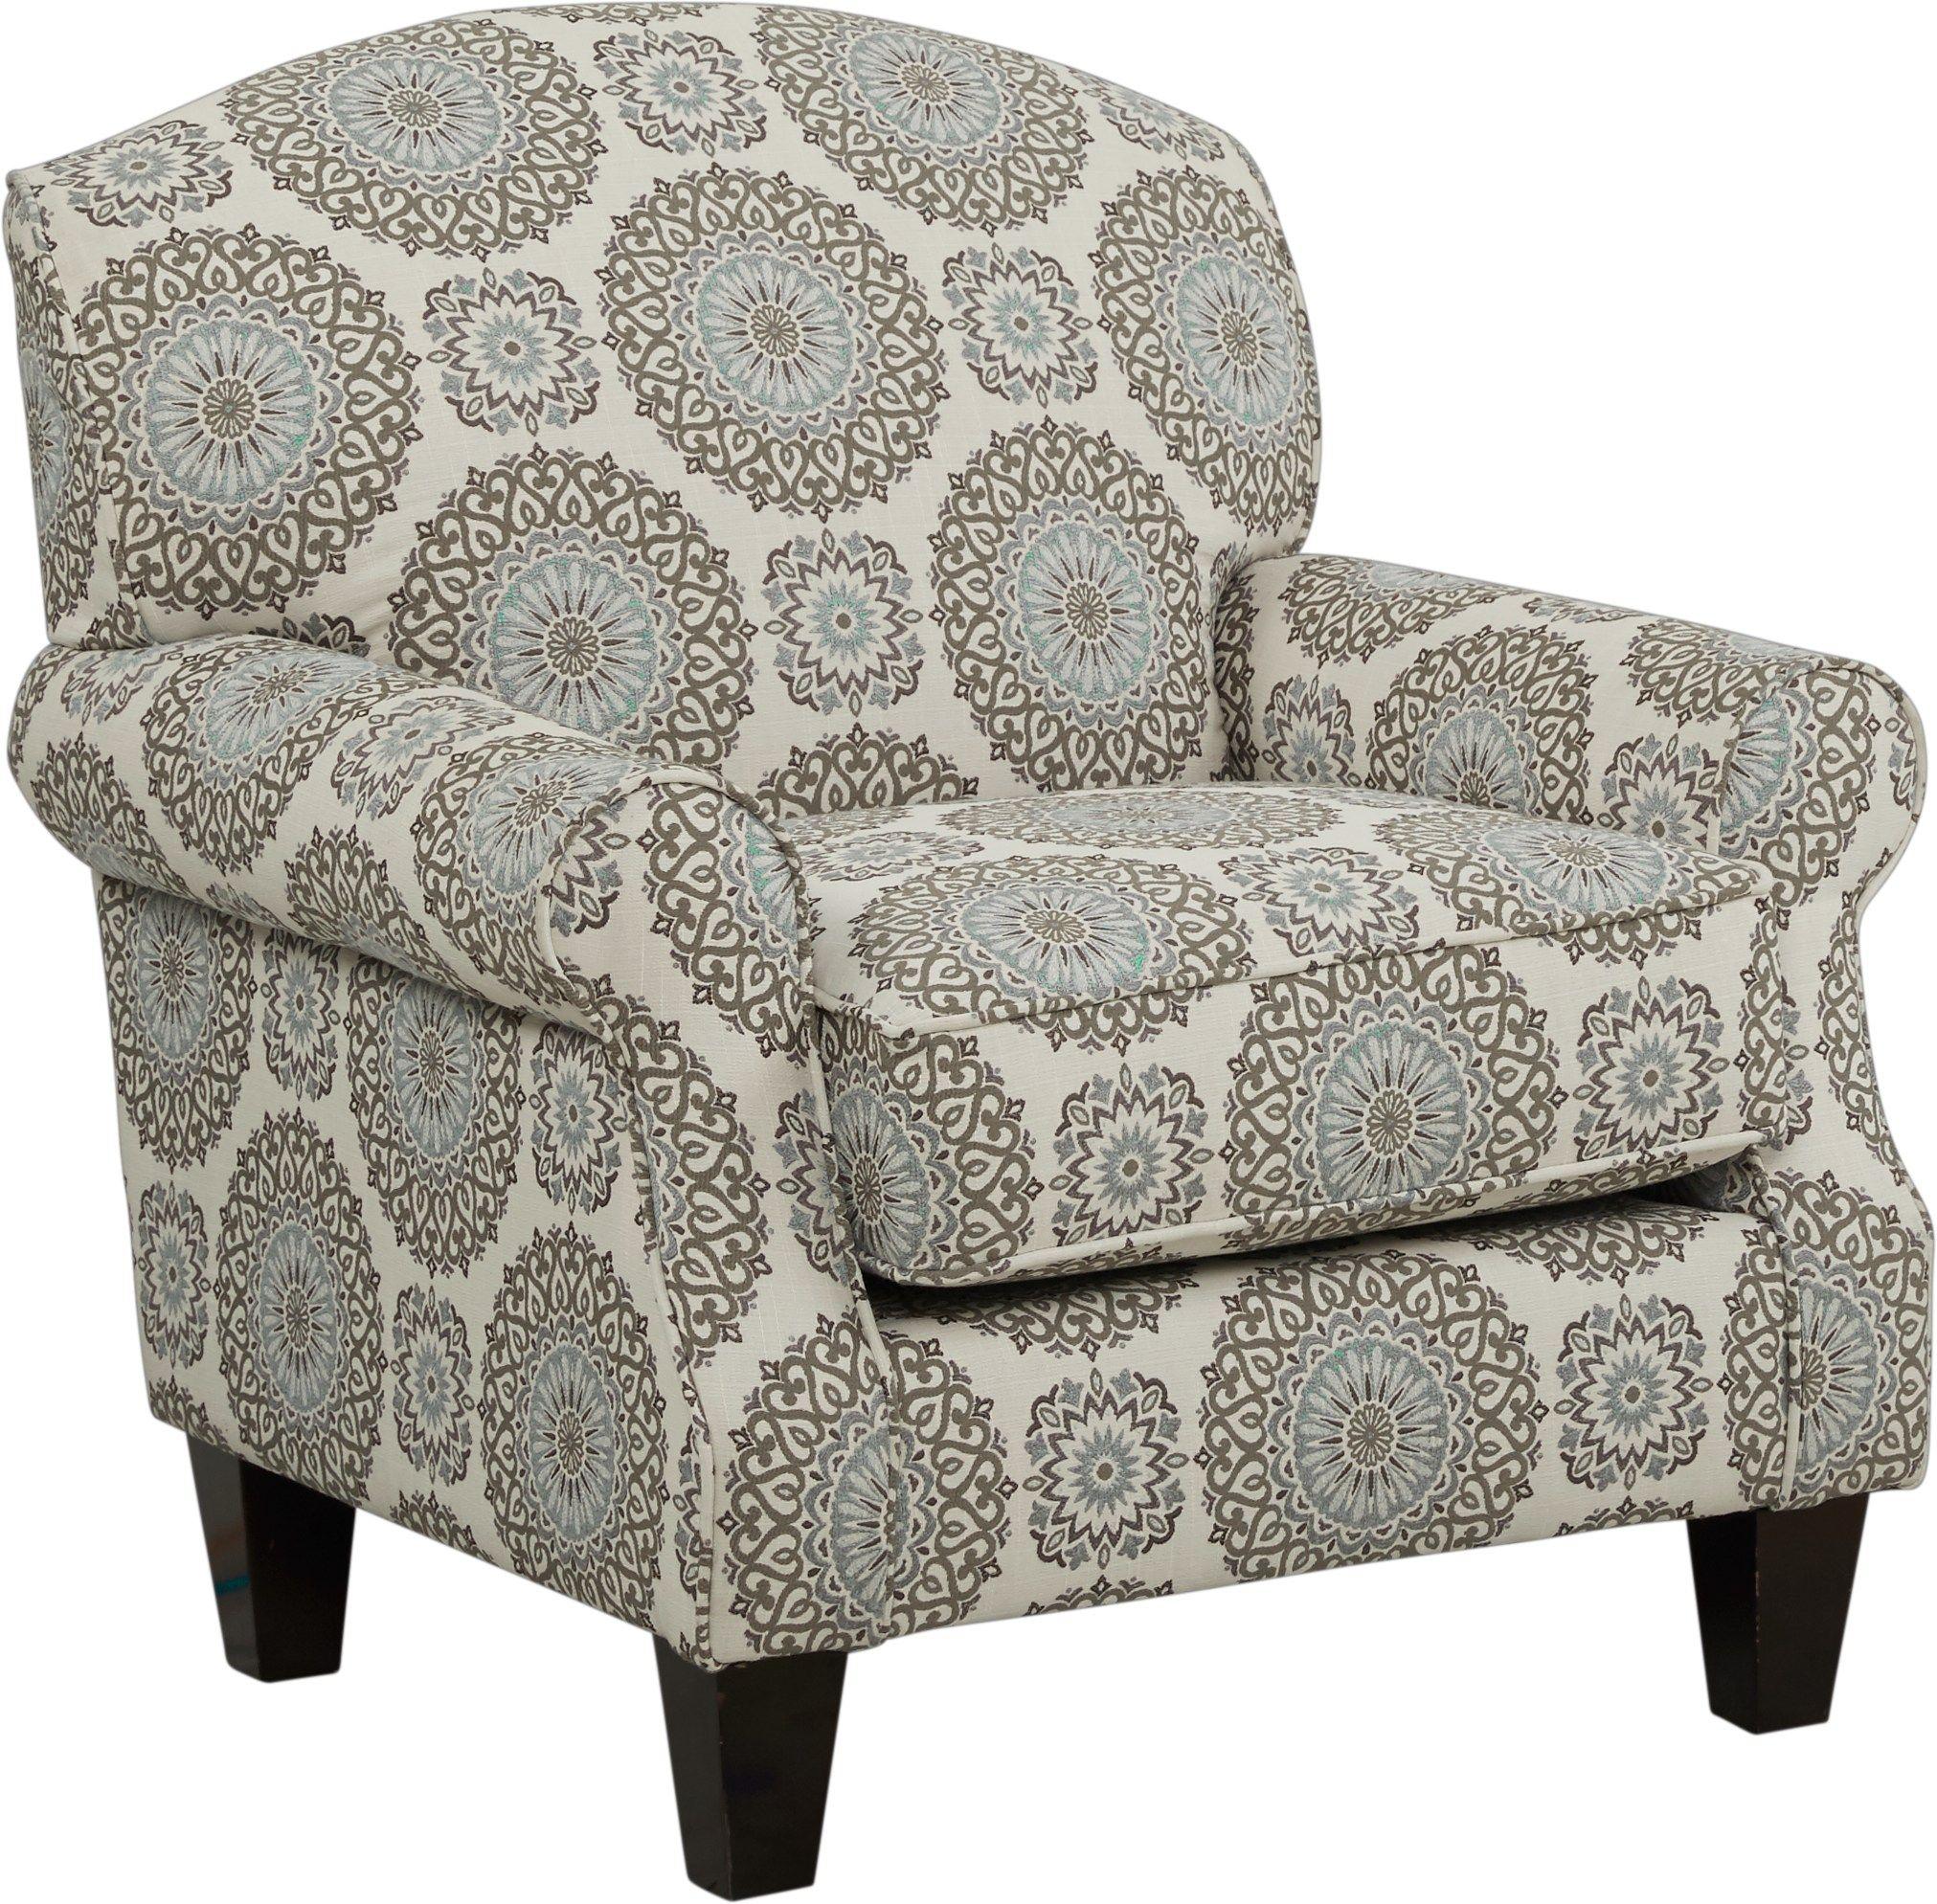 Best Pennington Blue Medallion Accent Chair Fabric Accent 400 x 300